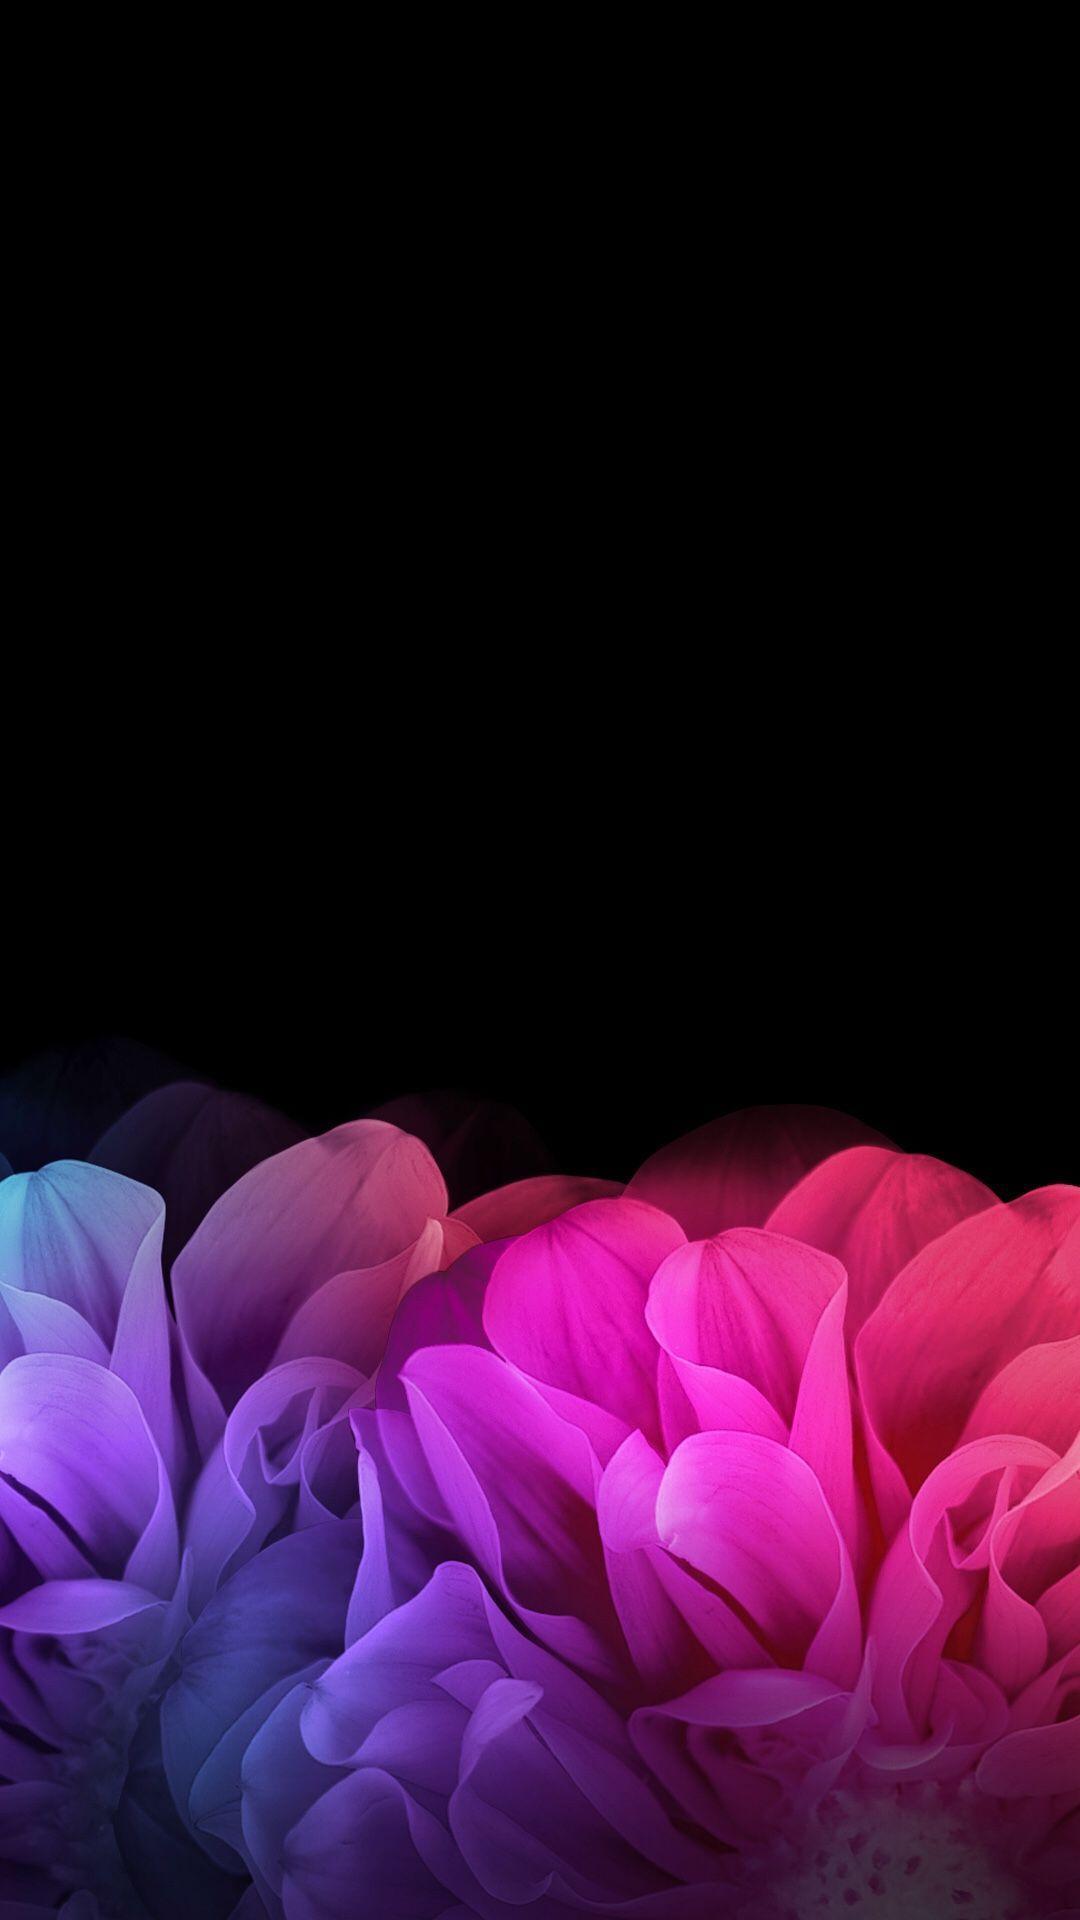 Black Flower Wallpapers Top Free Black Flower Backgrounds Wallpaperaccess